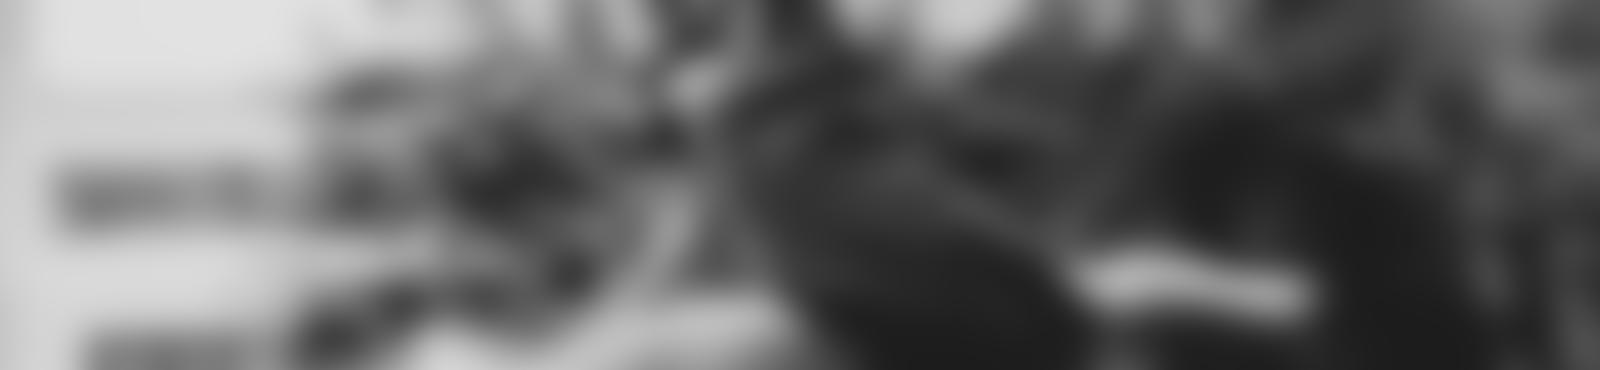 Blurred 52c41146 069d 4acf 8cc2 9c4f7a35fd1d